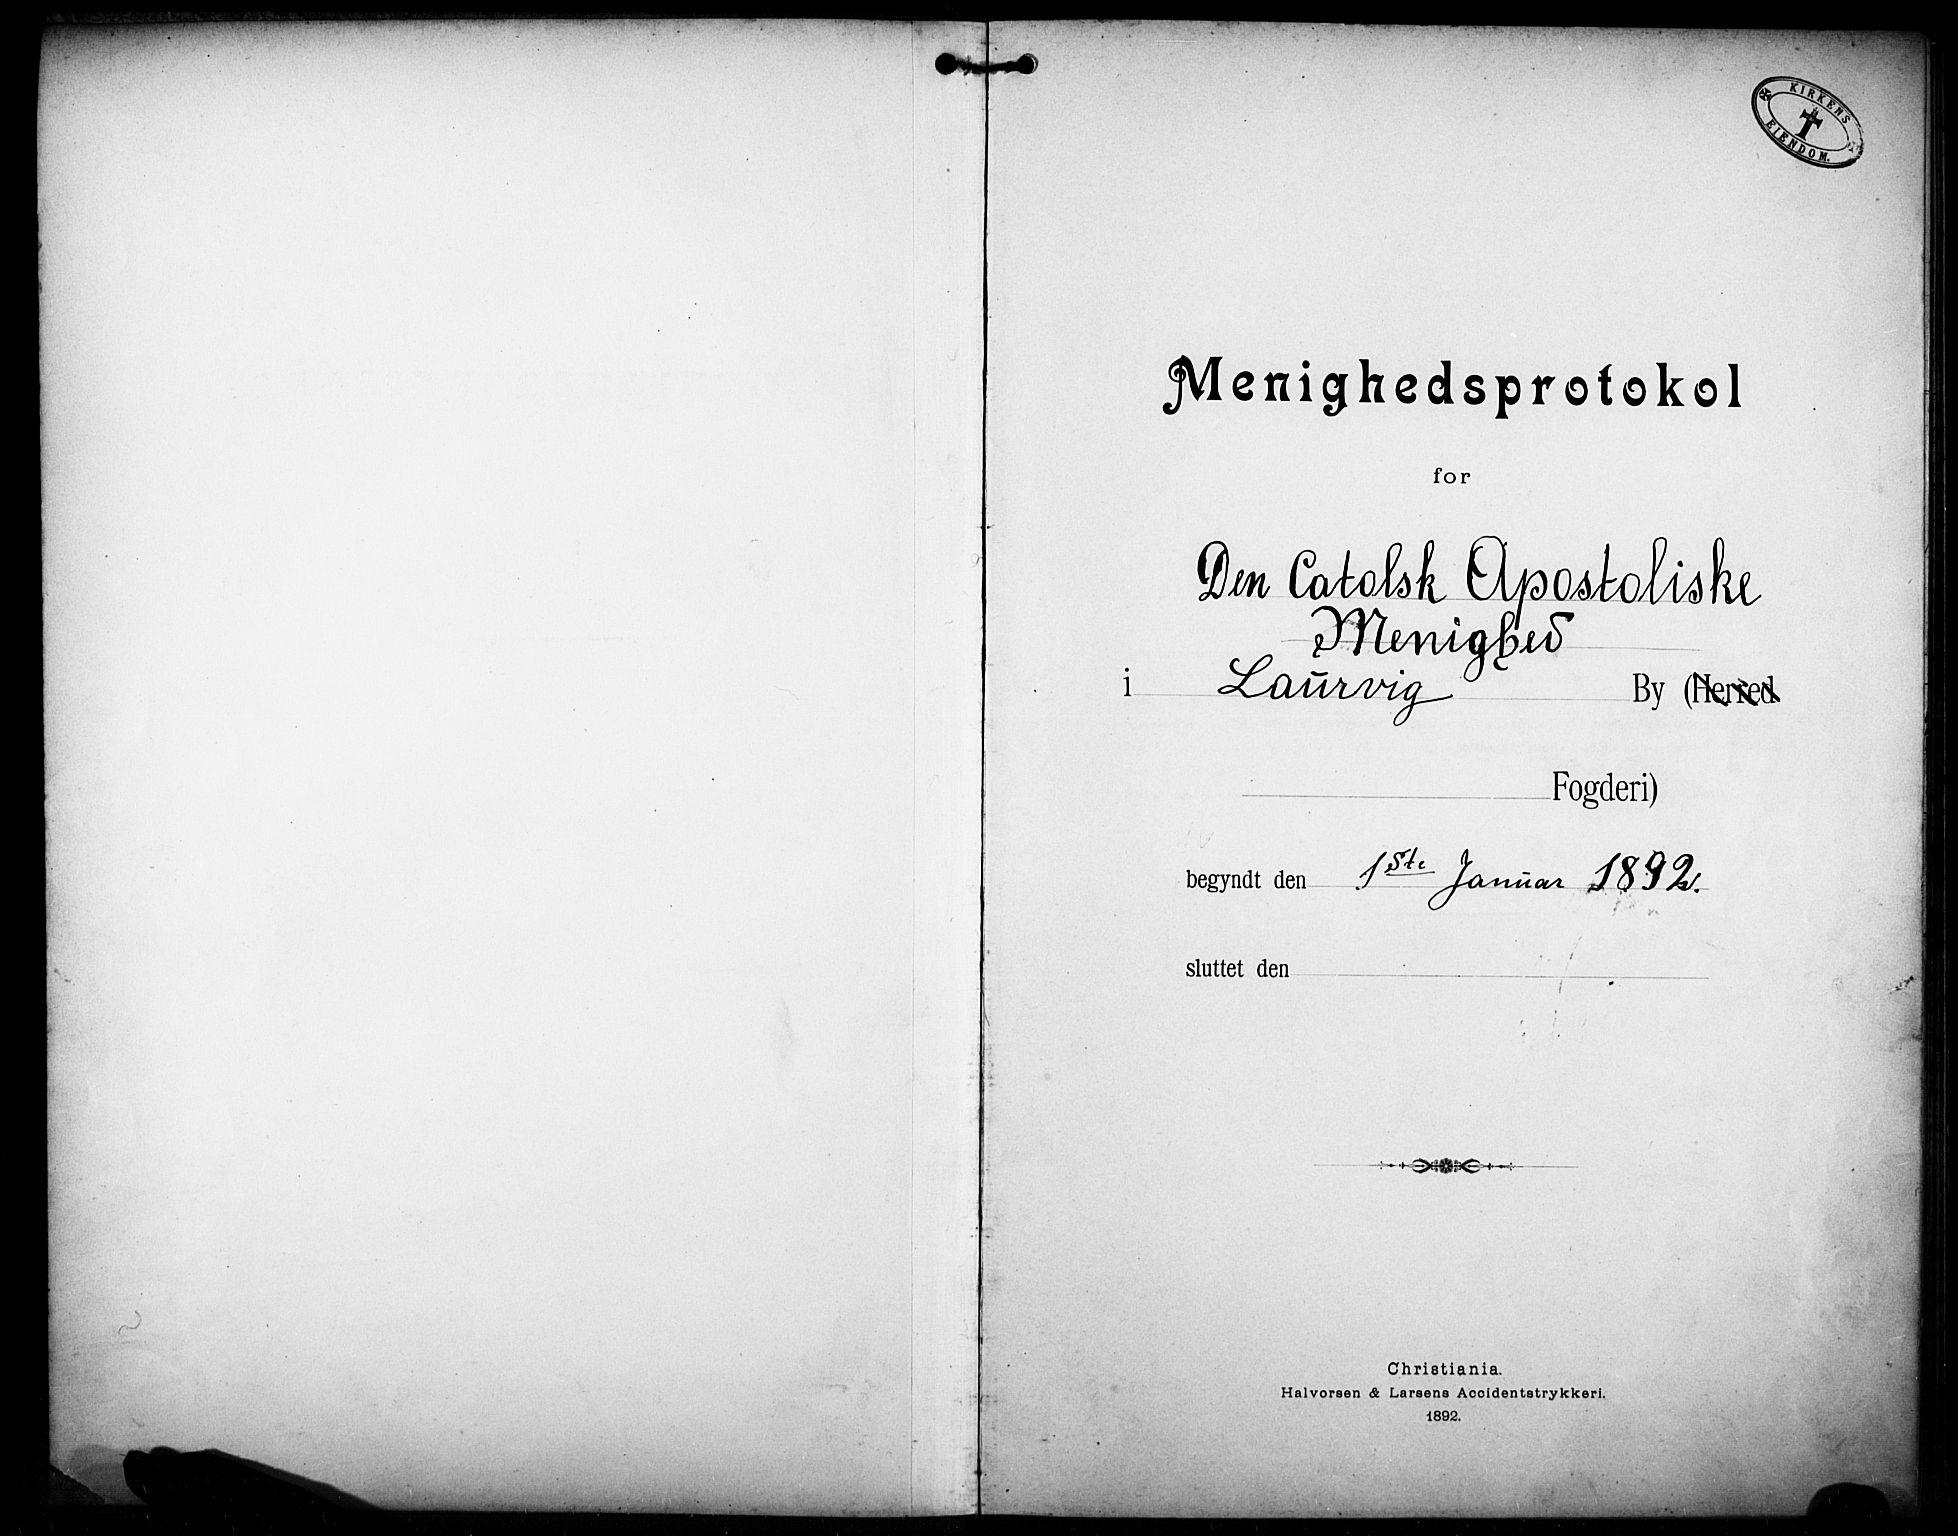 SAKO, Den katolsk-apostoliske menighet i Larvik, F/Fa/L0001: Dissenterprotokoll nr. 1, 1892-1933